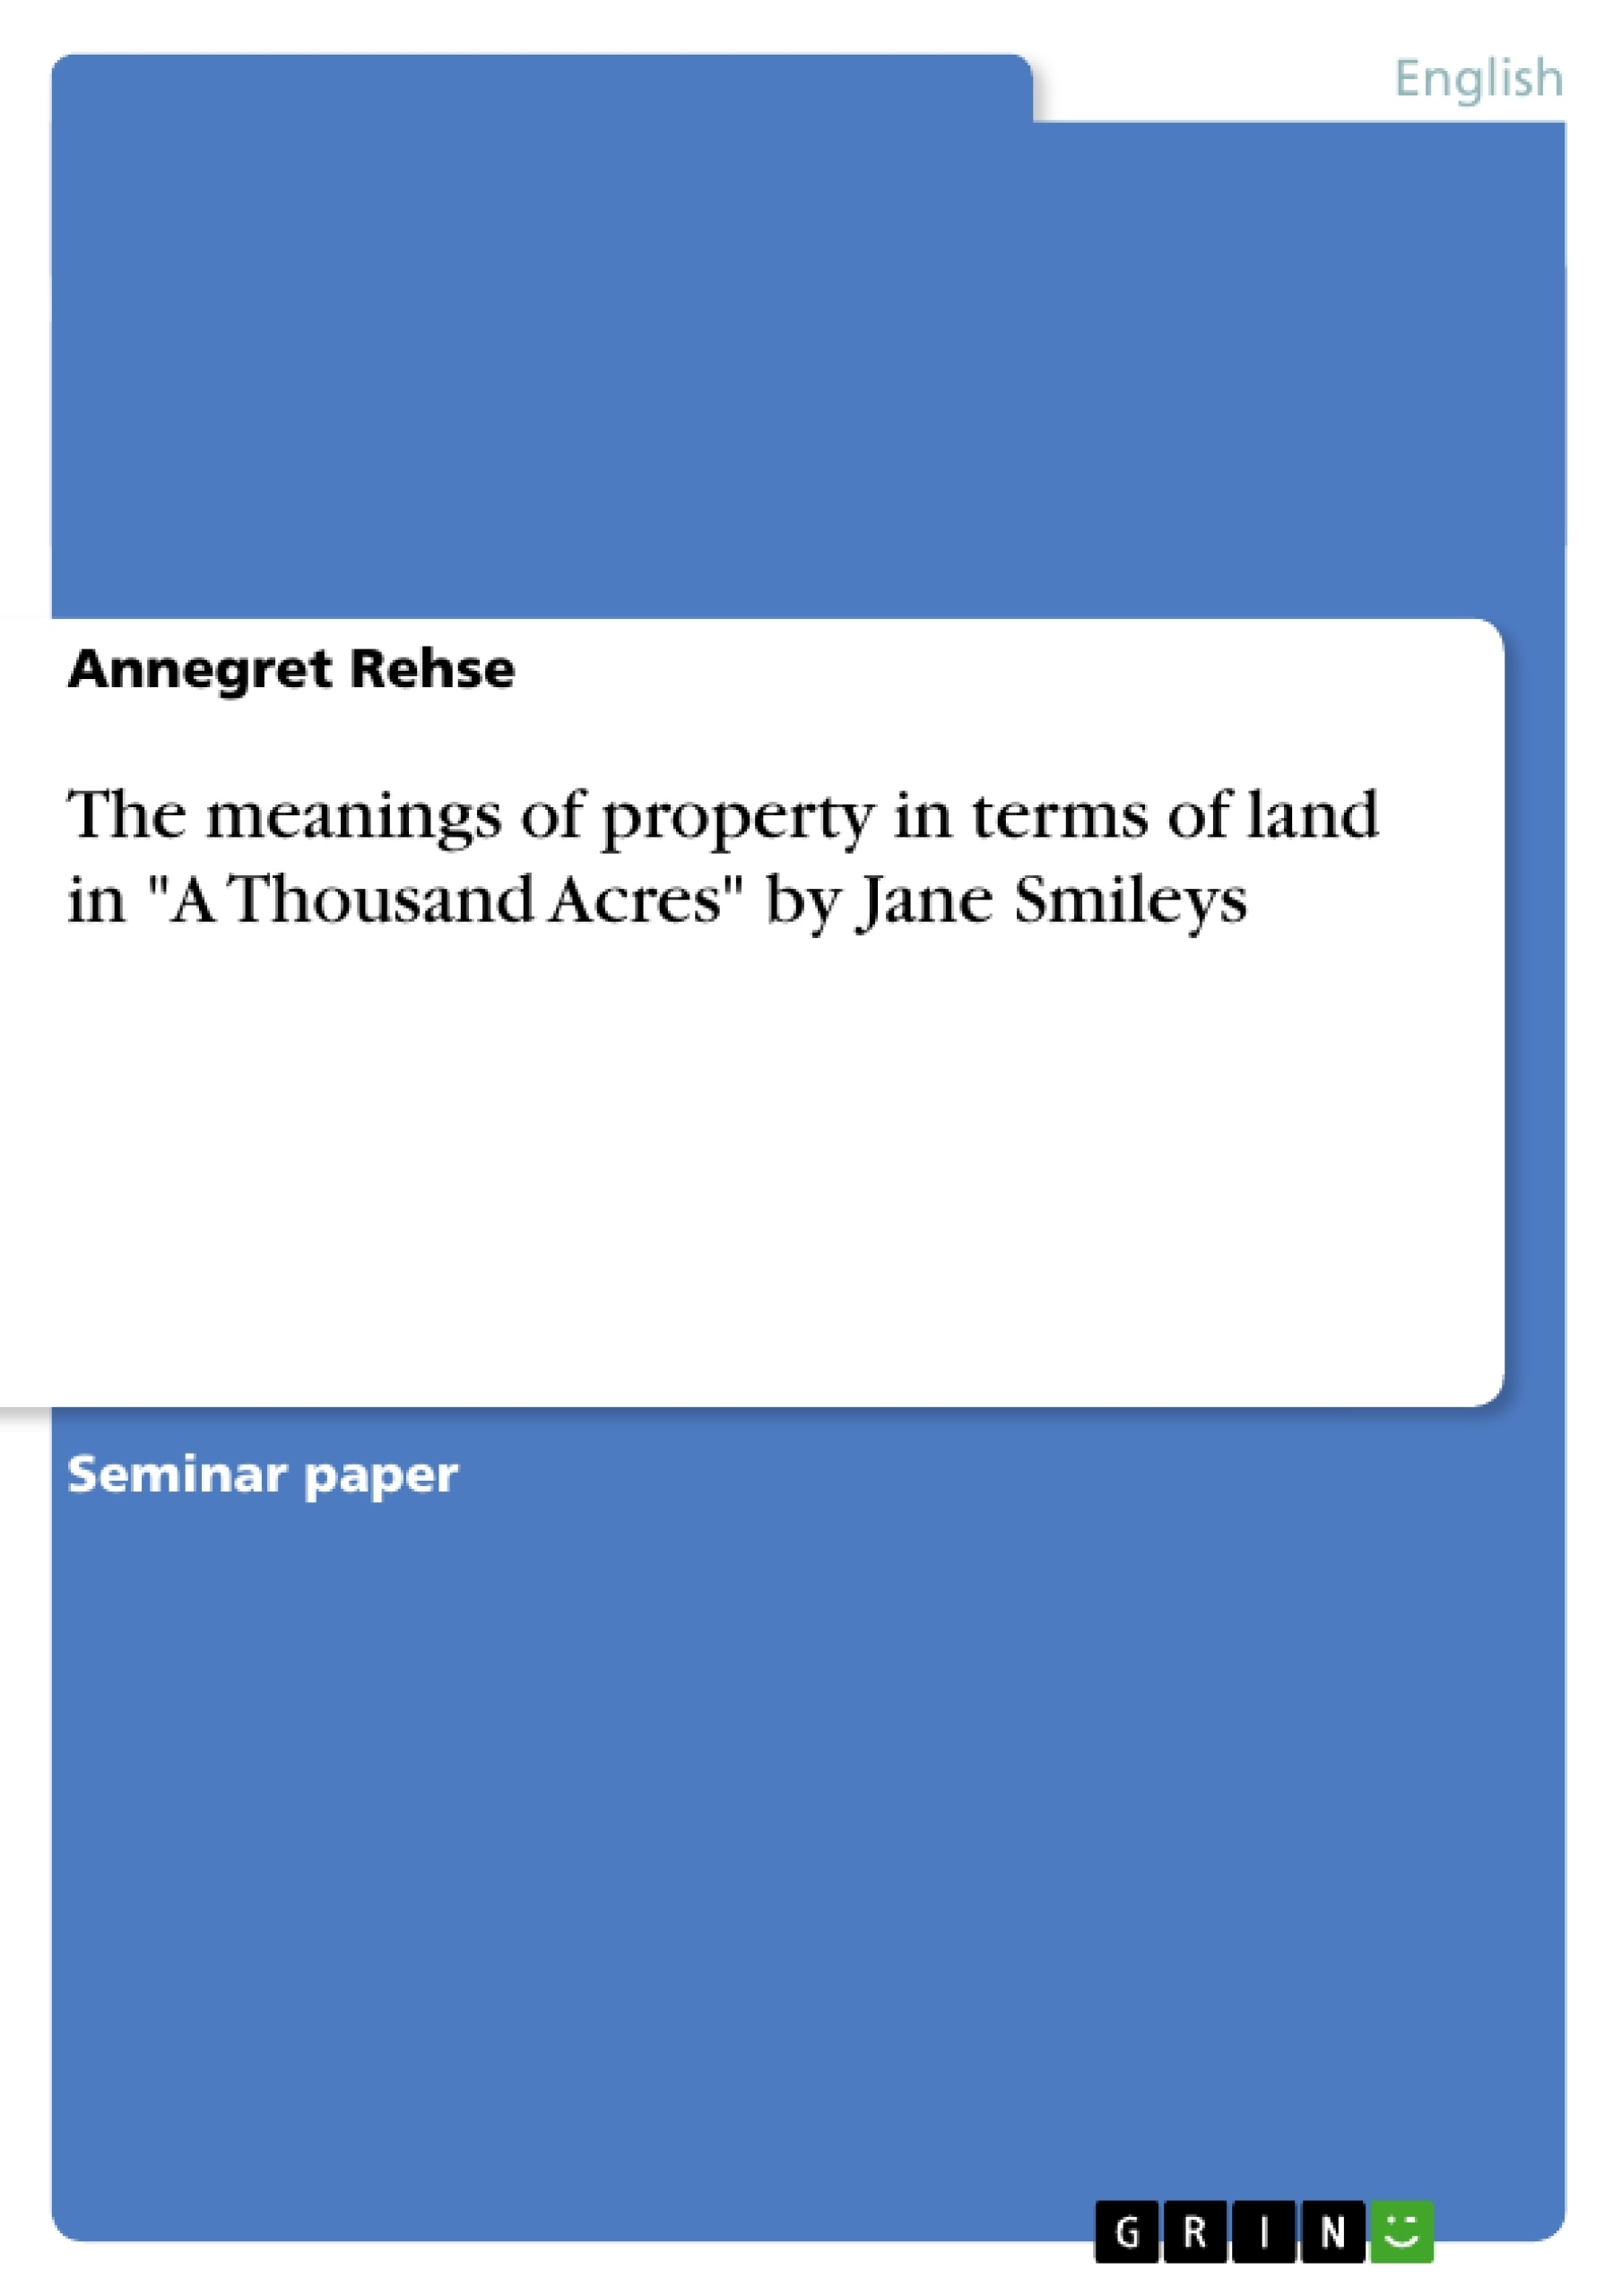 Essay help ......King Lear/ thousand acres...10 points ?